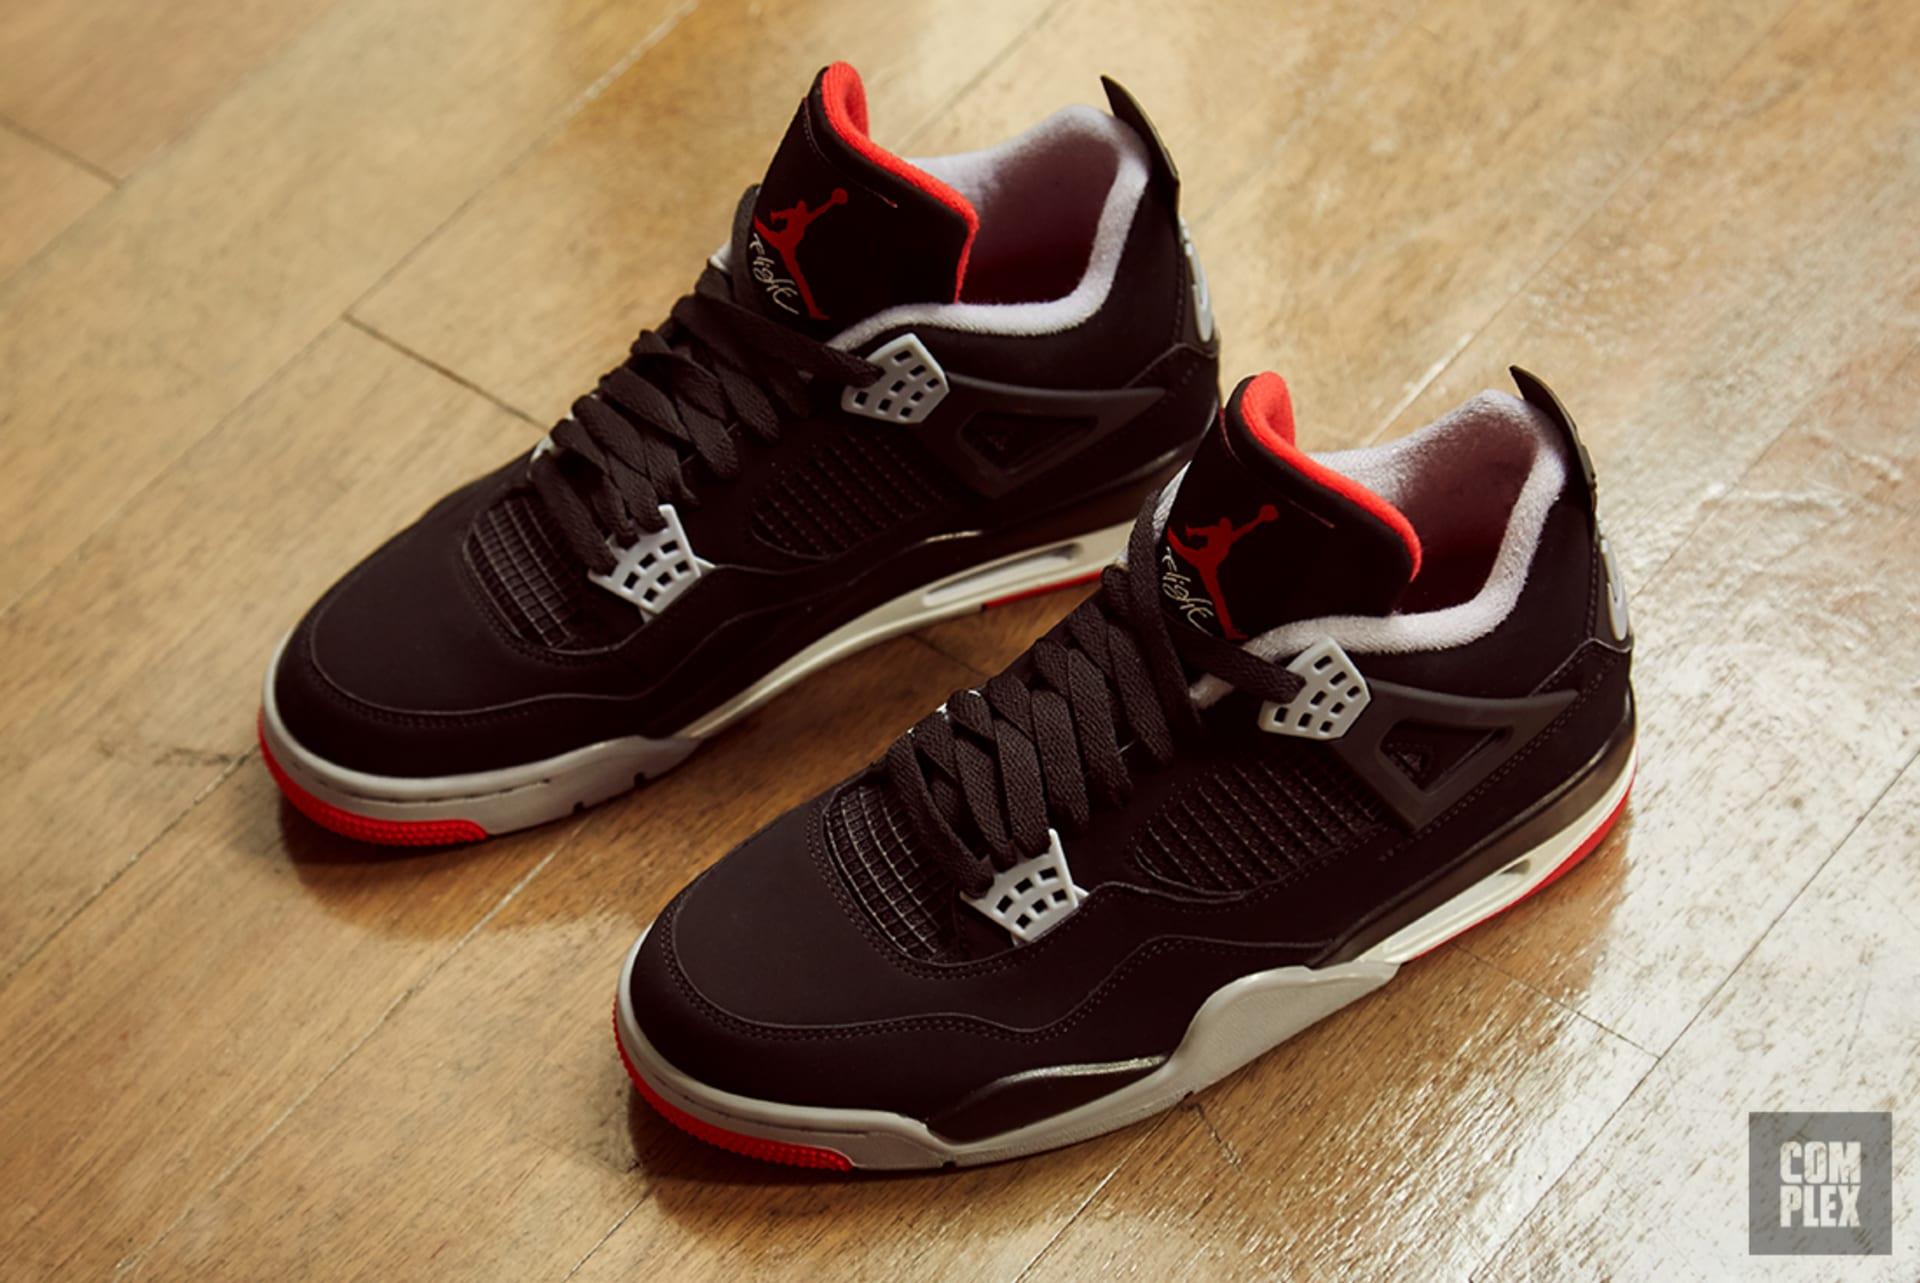 5c44dcb8d085 Air Jordan 4  How The Sneaker Became a Cultural Phenomenon